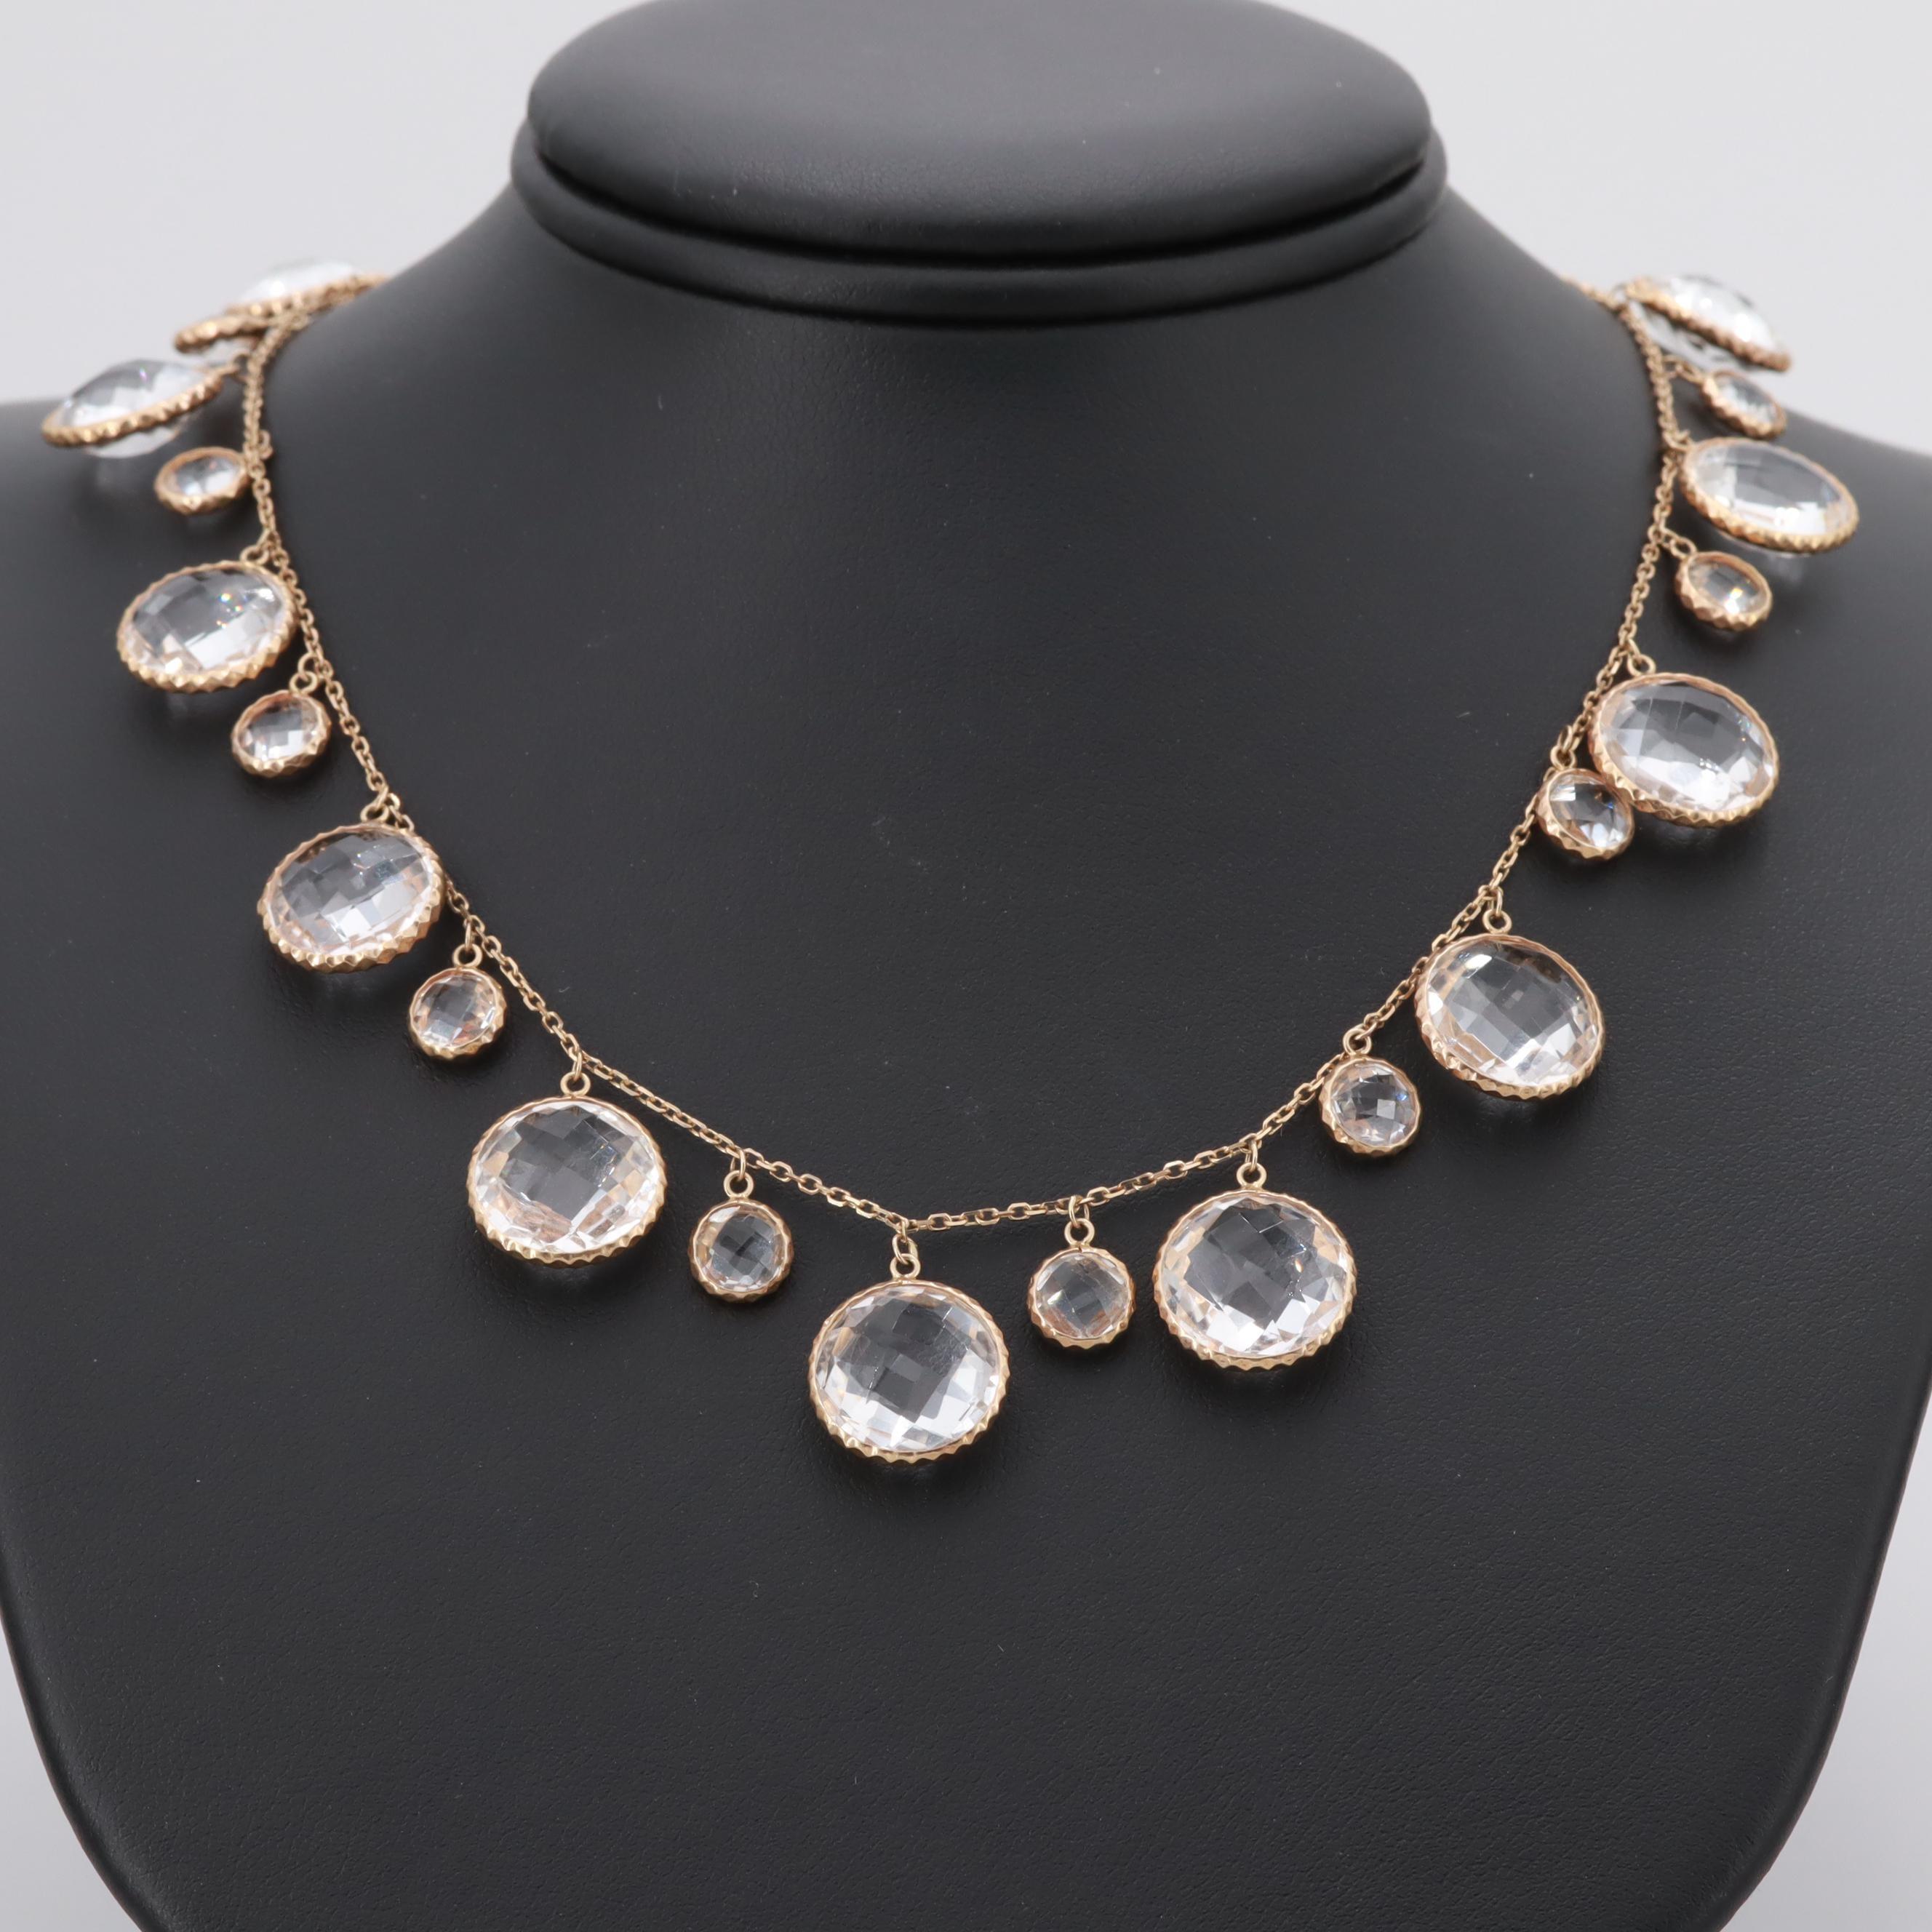 14K Yellow Gold Quartz Crystal Station Necklace